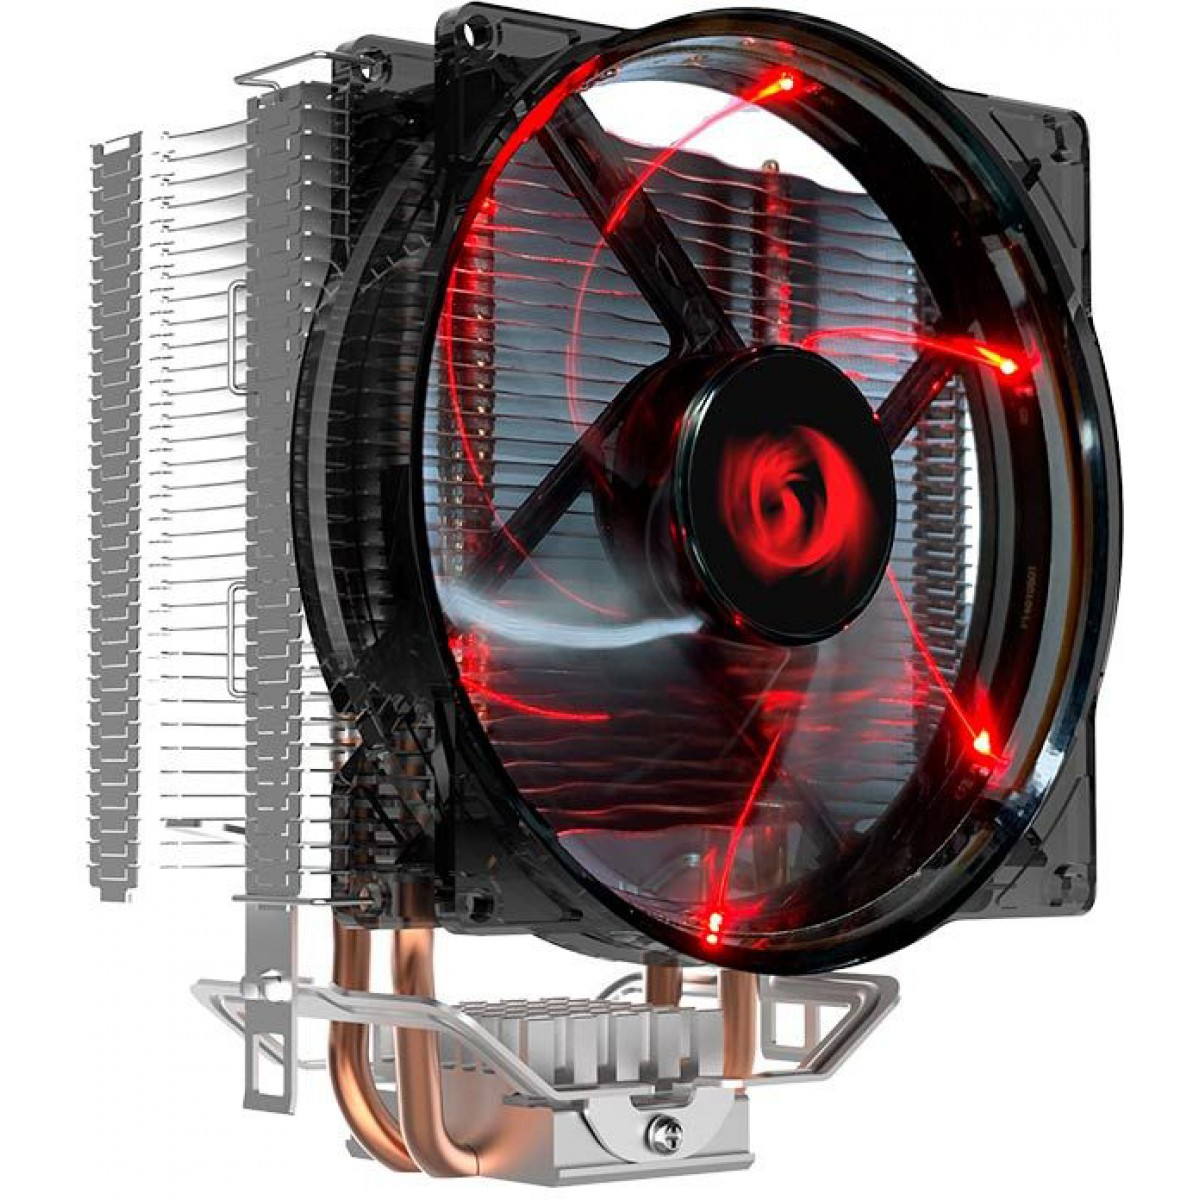 Cooler Redragon Reaver Cc-1011 Led Vermelho